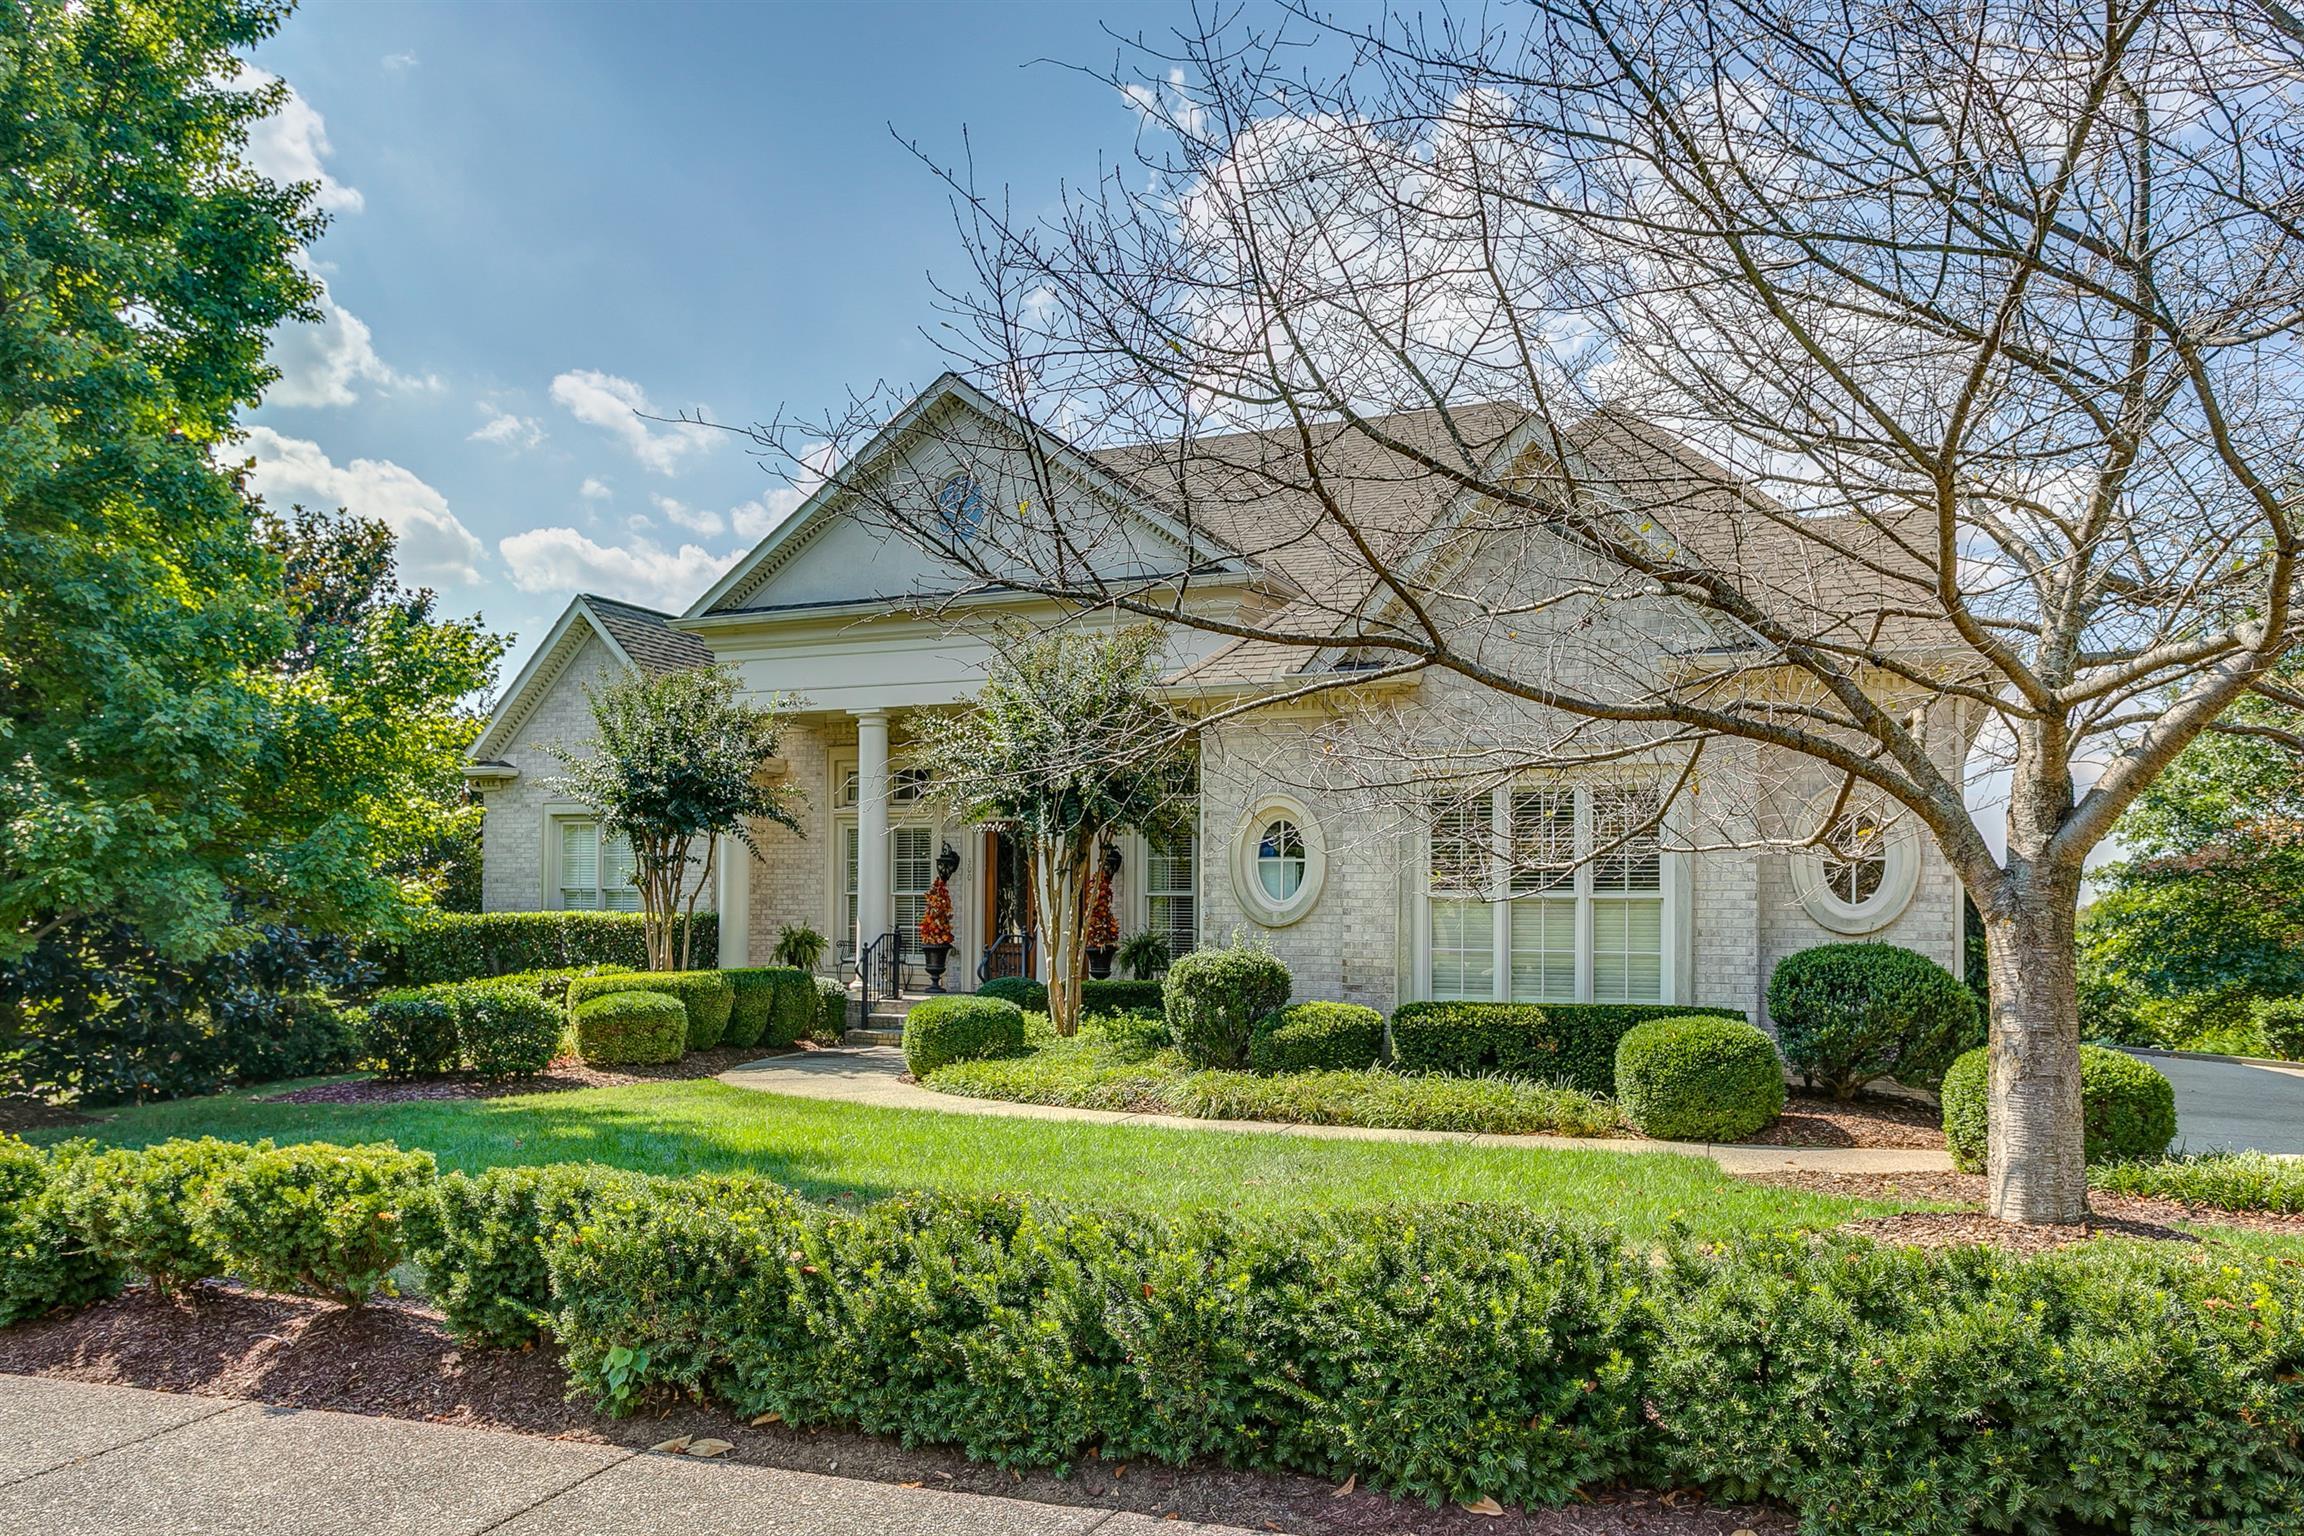 300 Haddon Ct, Franklin, TN 37067 - Franklin, TN real estate listing